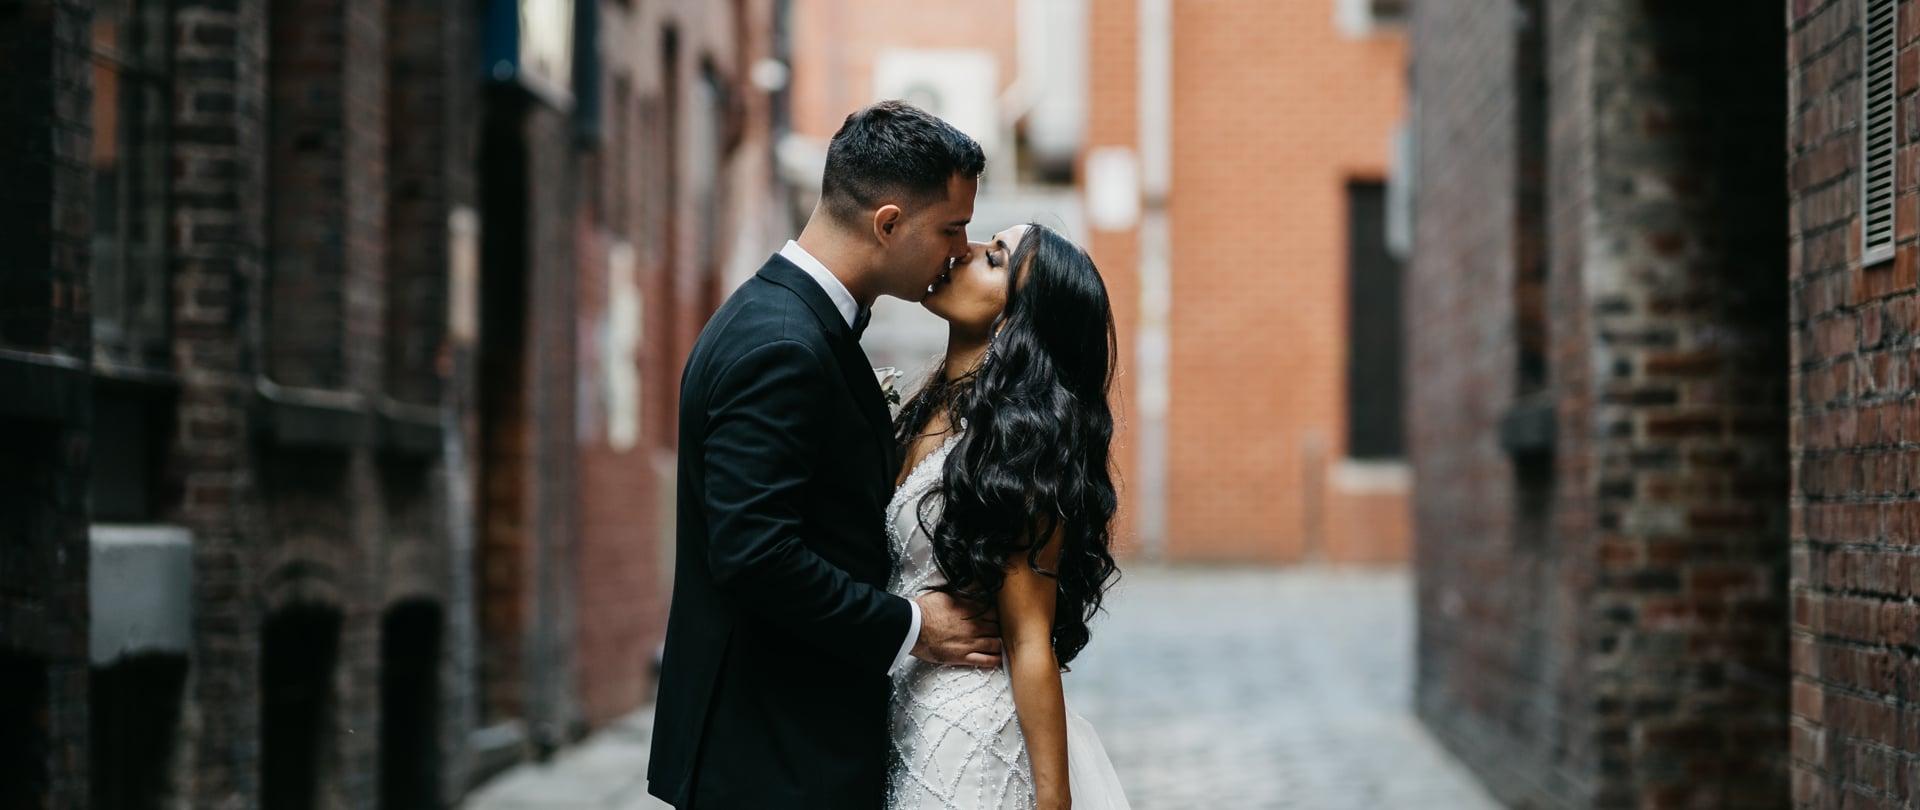 Renee & Fabian Wedding Video Filmed at Melbourne, Victoria